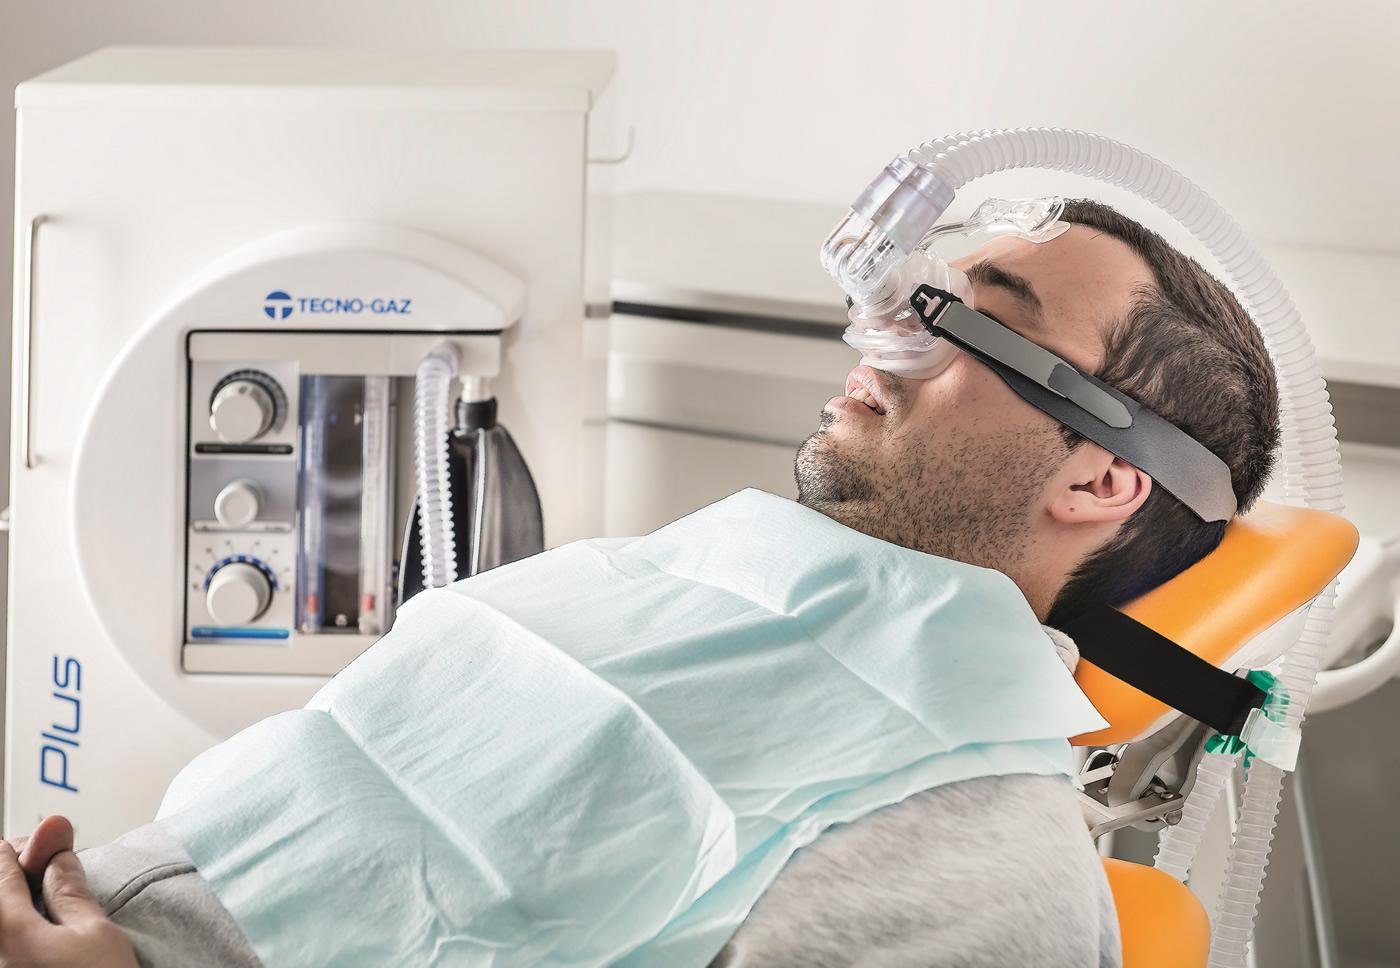 Equip Sedació conscient | Centre Dental Cise | Figueres